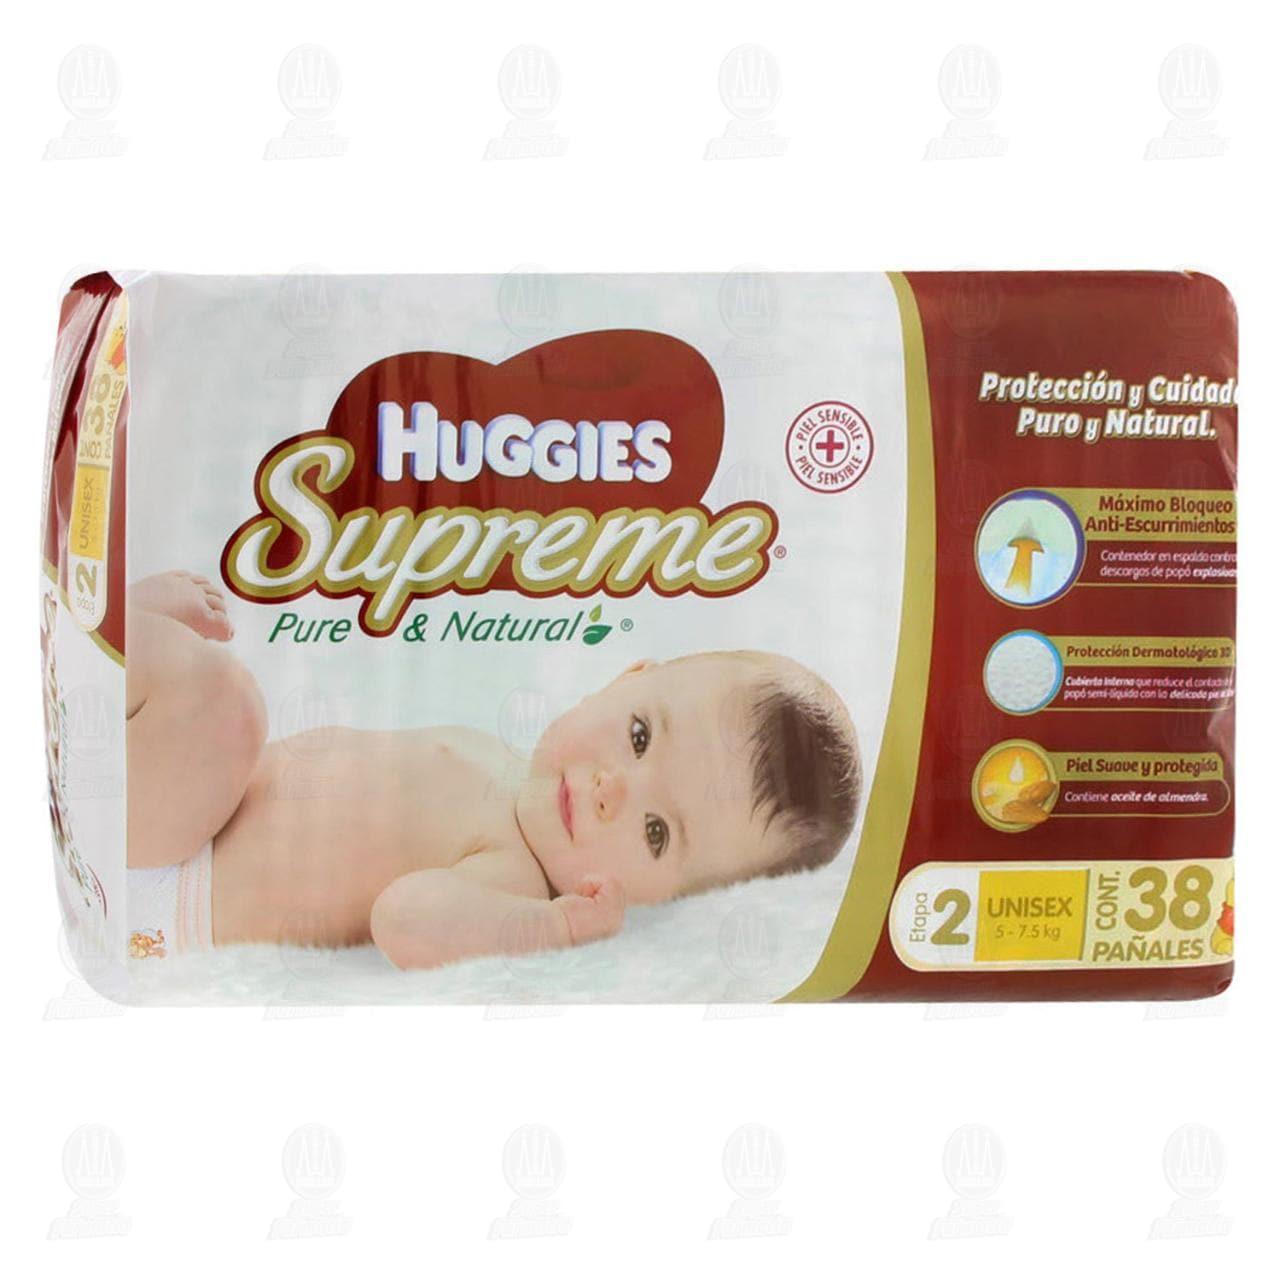 Comprar Pañales para Bebé Huggies Supreme Pure & Natural Unisex Etapa 2, 38 pzas. en Farmacias Guadalajara